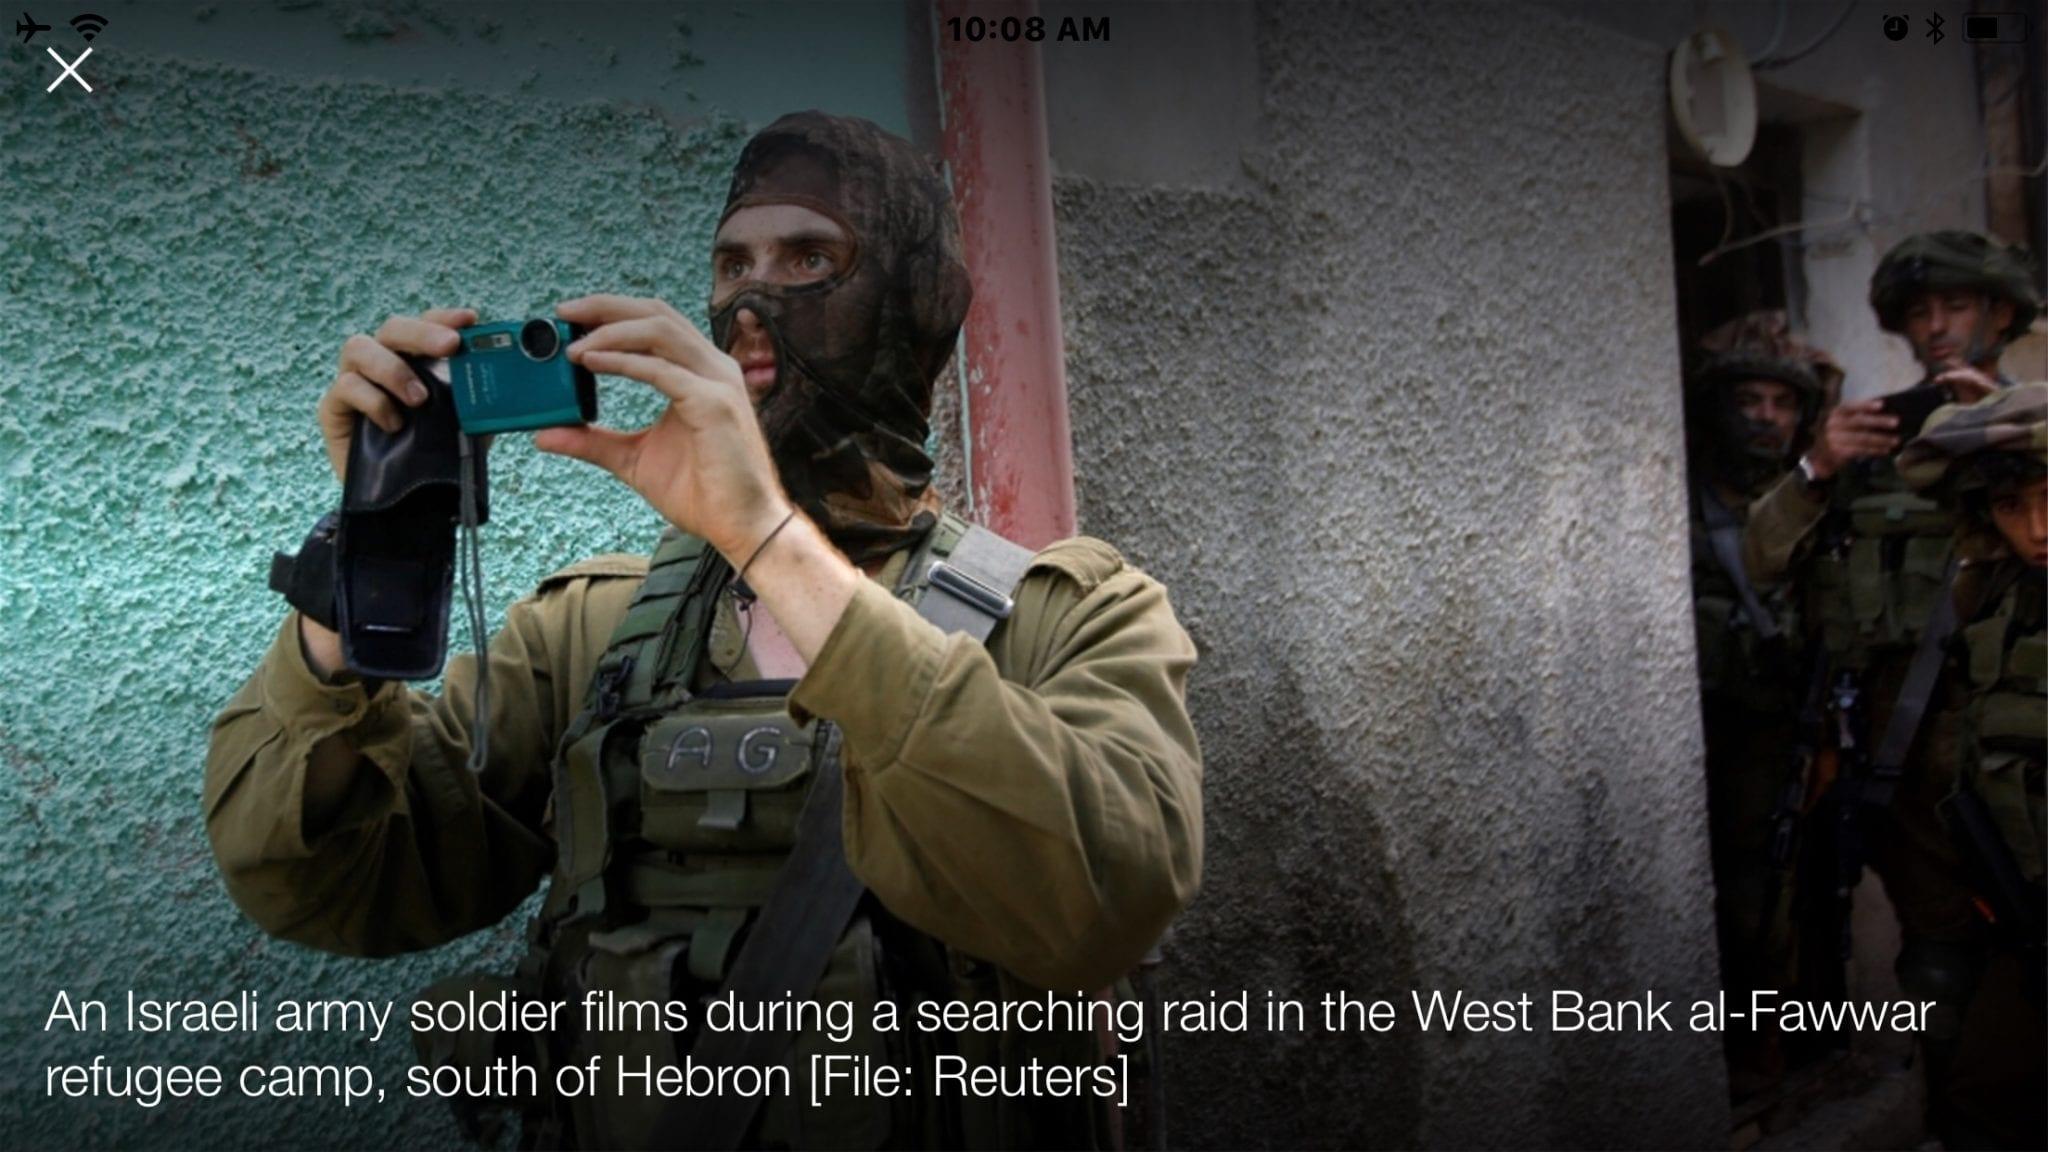 Israeli bill to ban filming soldiers on duty condemned | News | Al Jazeera